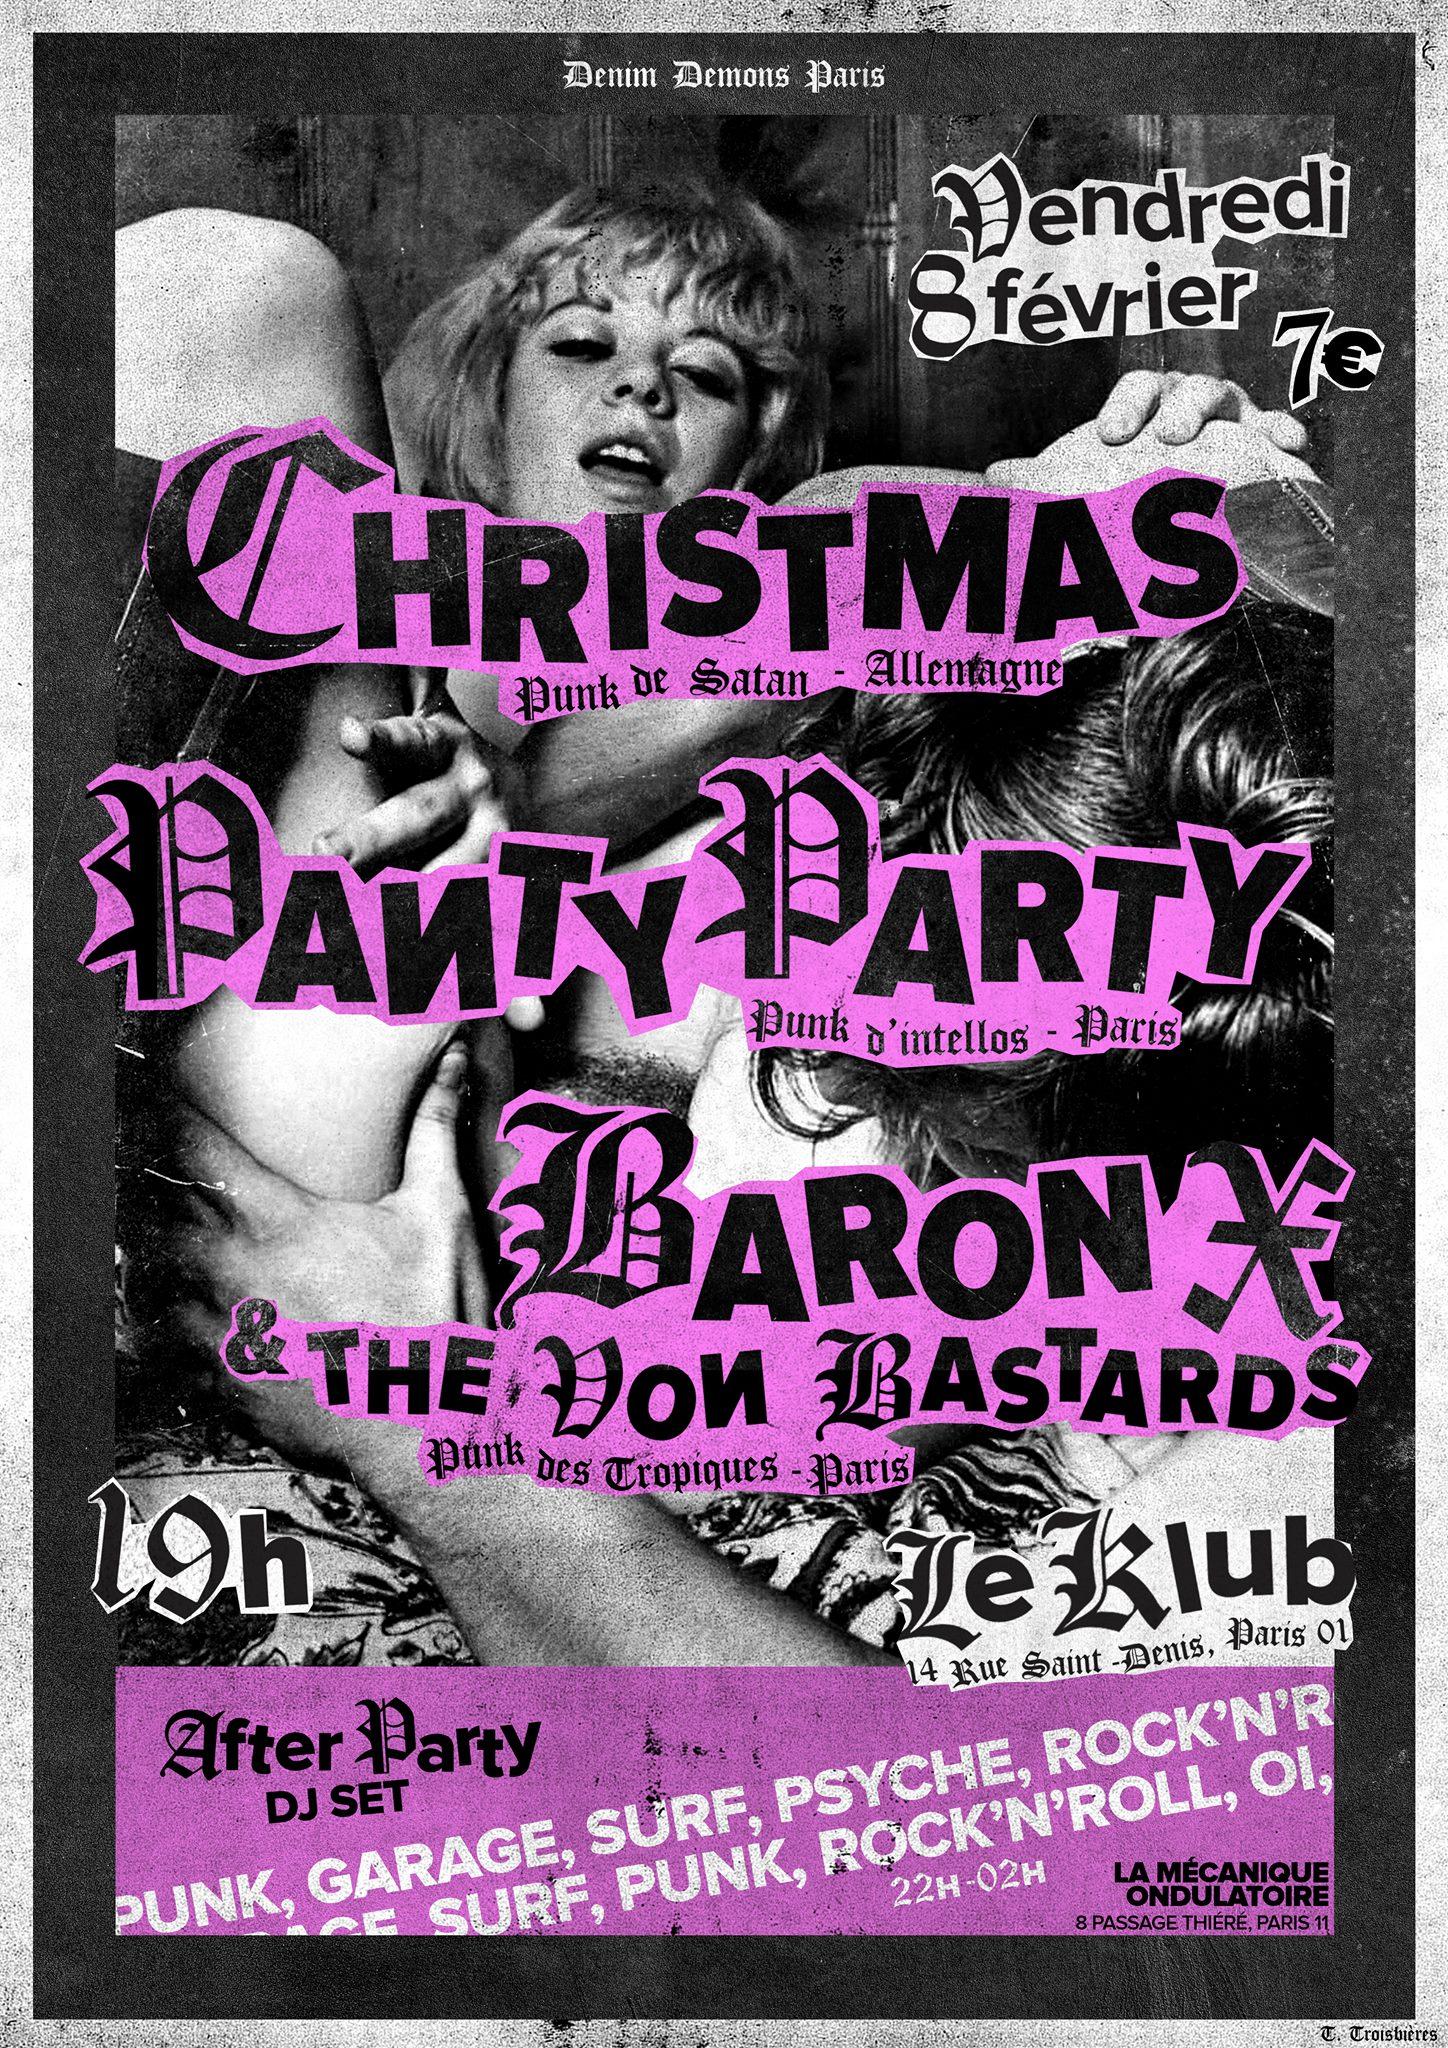 CHRISTMAS + PANTY PARTY + Baron X & the Von Bastards ■ 08.02